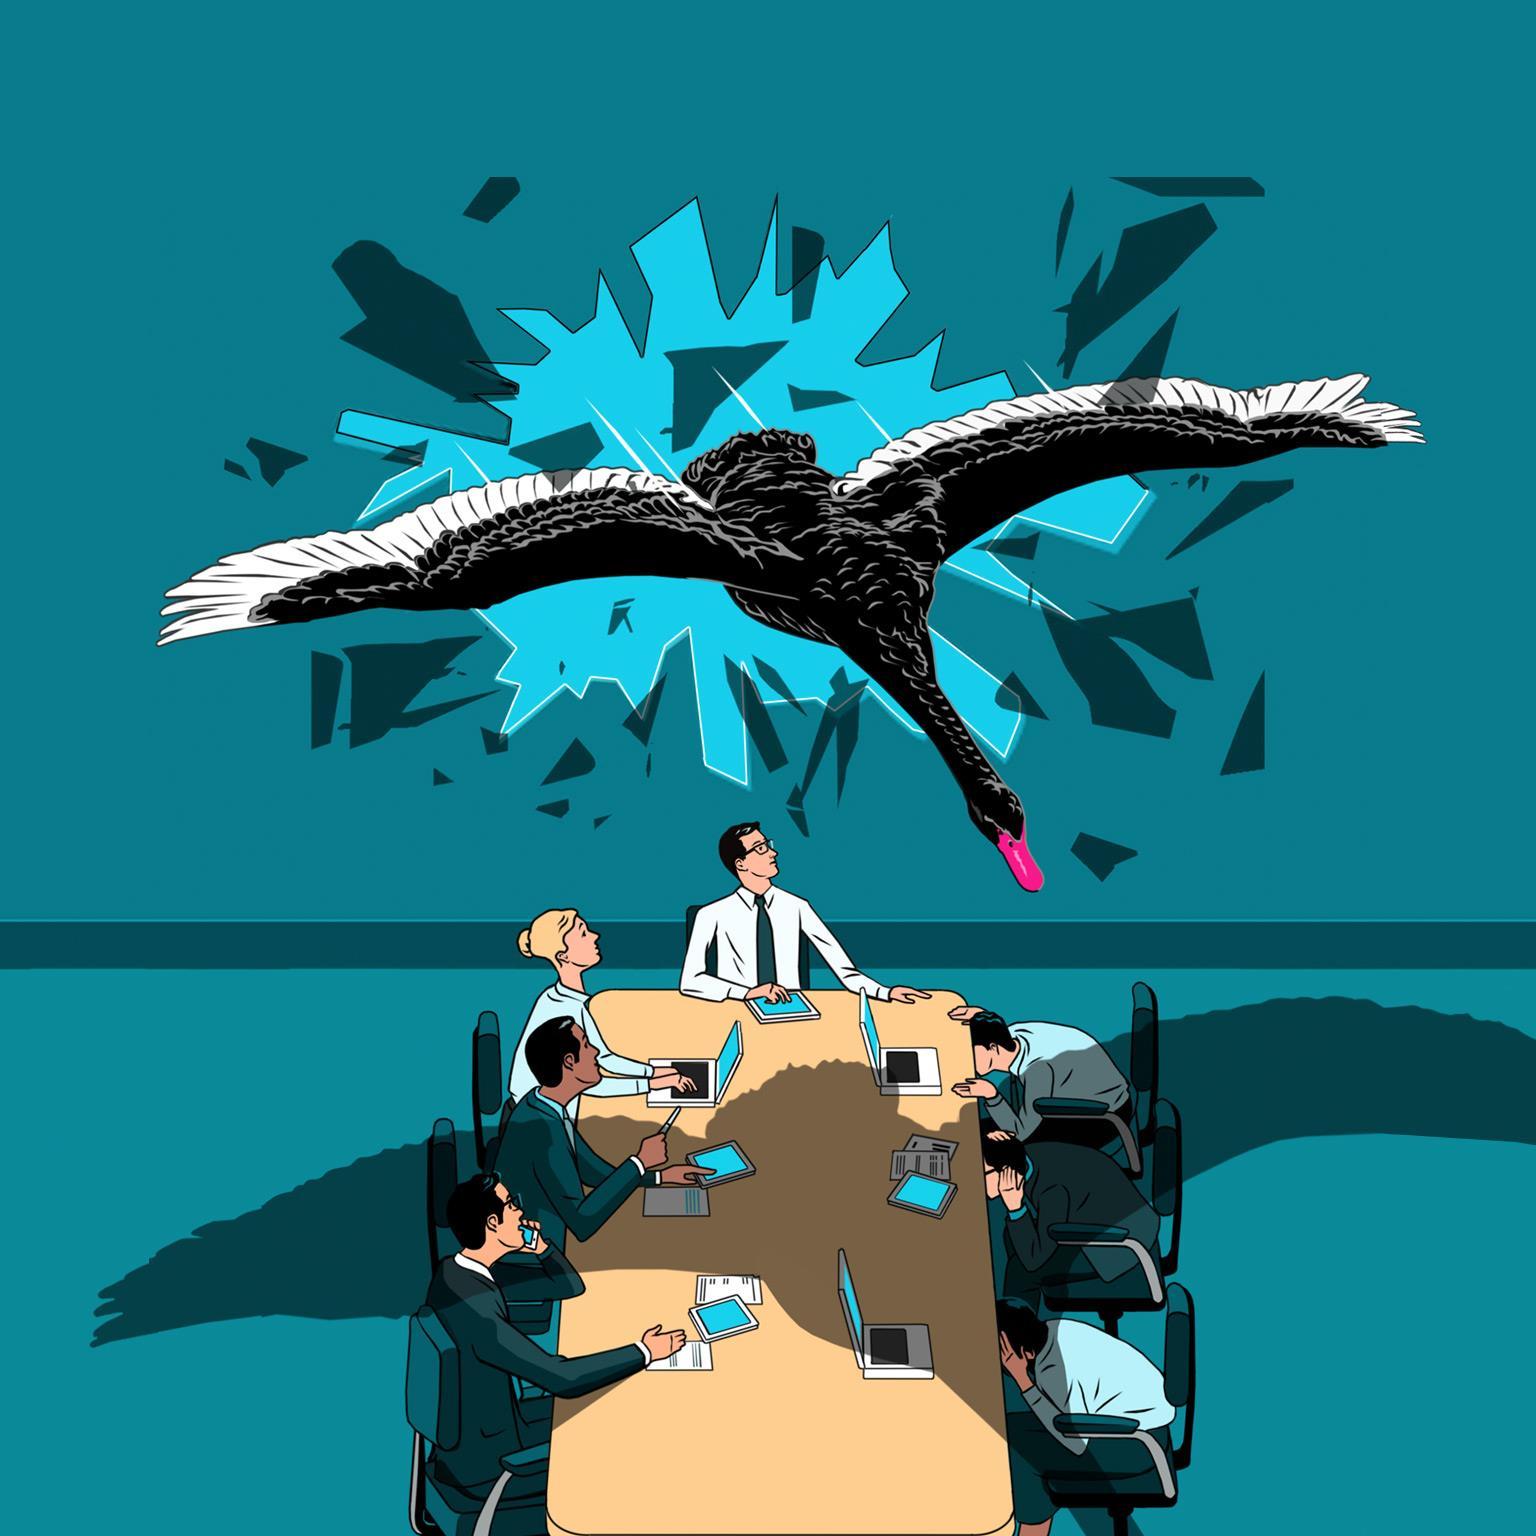 Resultado de imagen de Are you prepared for a corporate crisis?